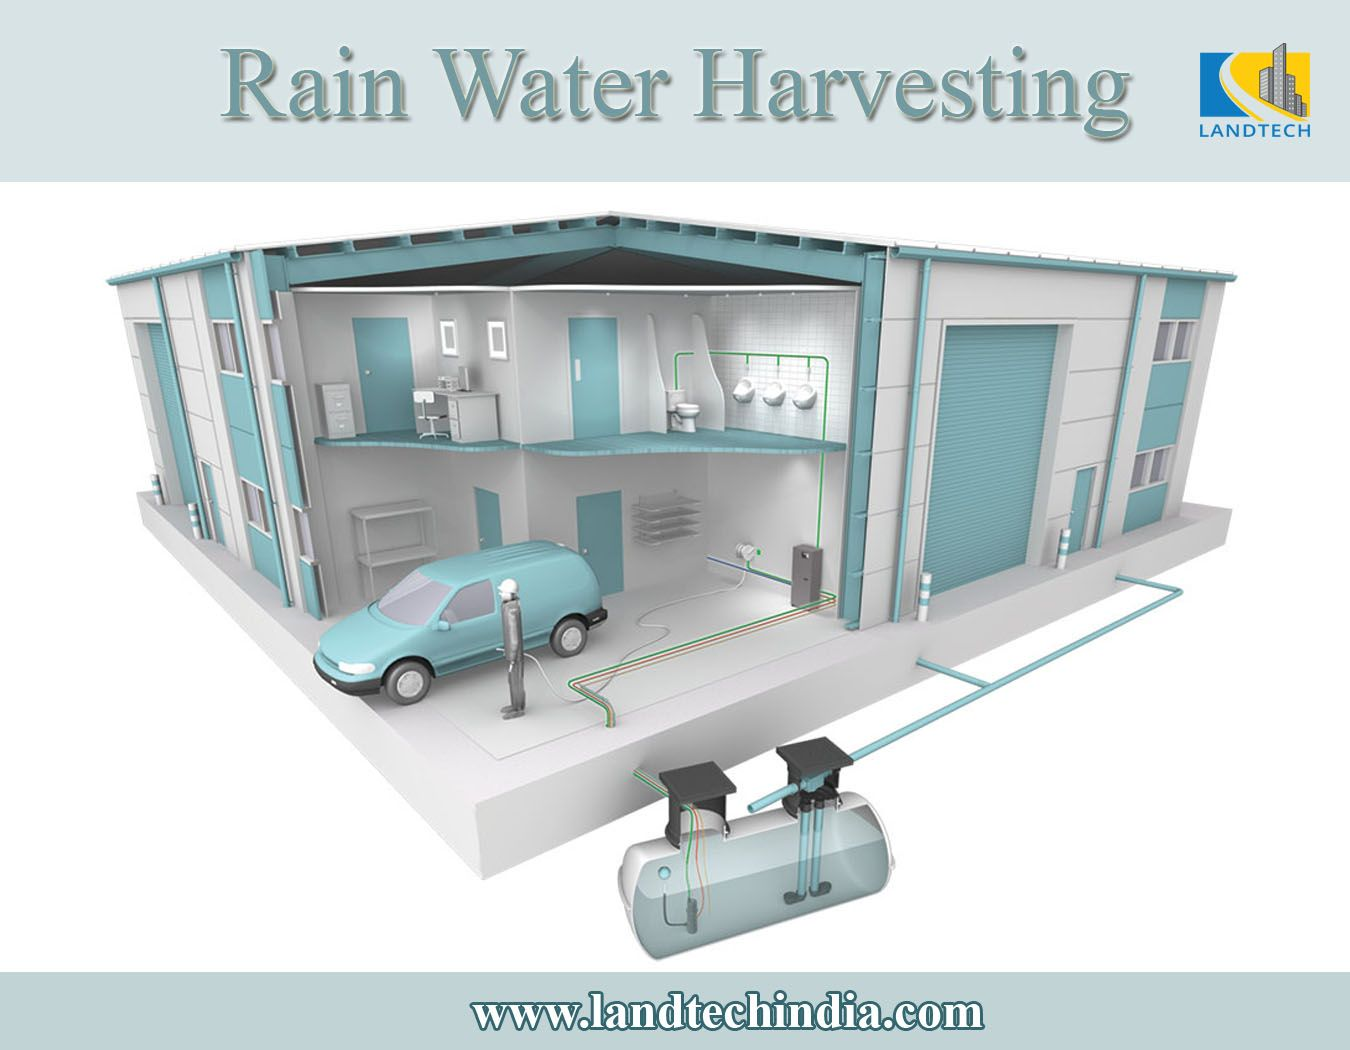 Save Water with Rainwater Harvesting...landtechindia